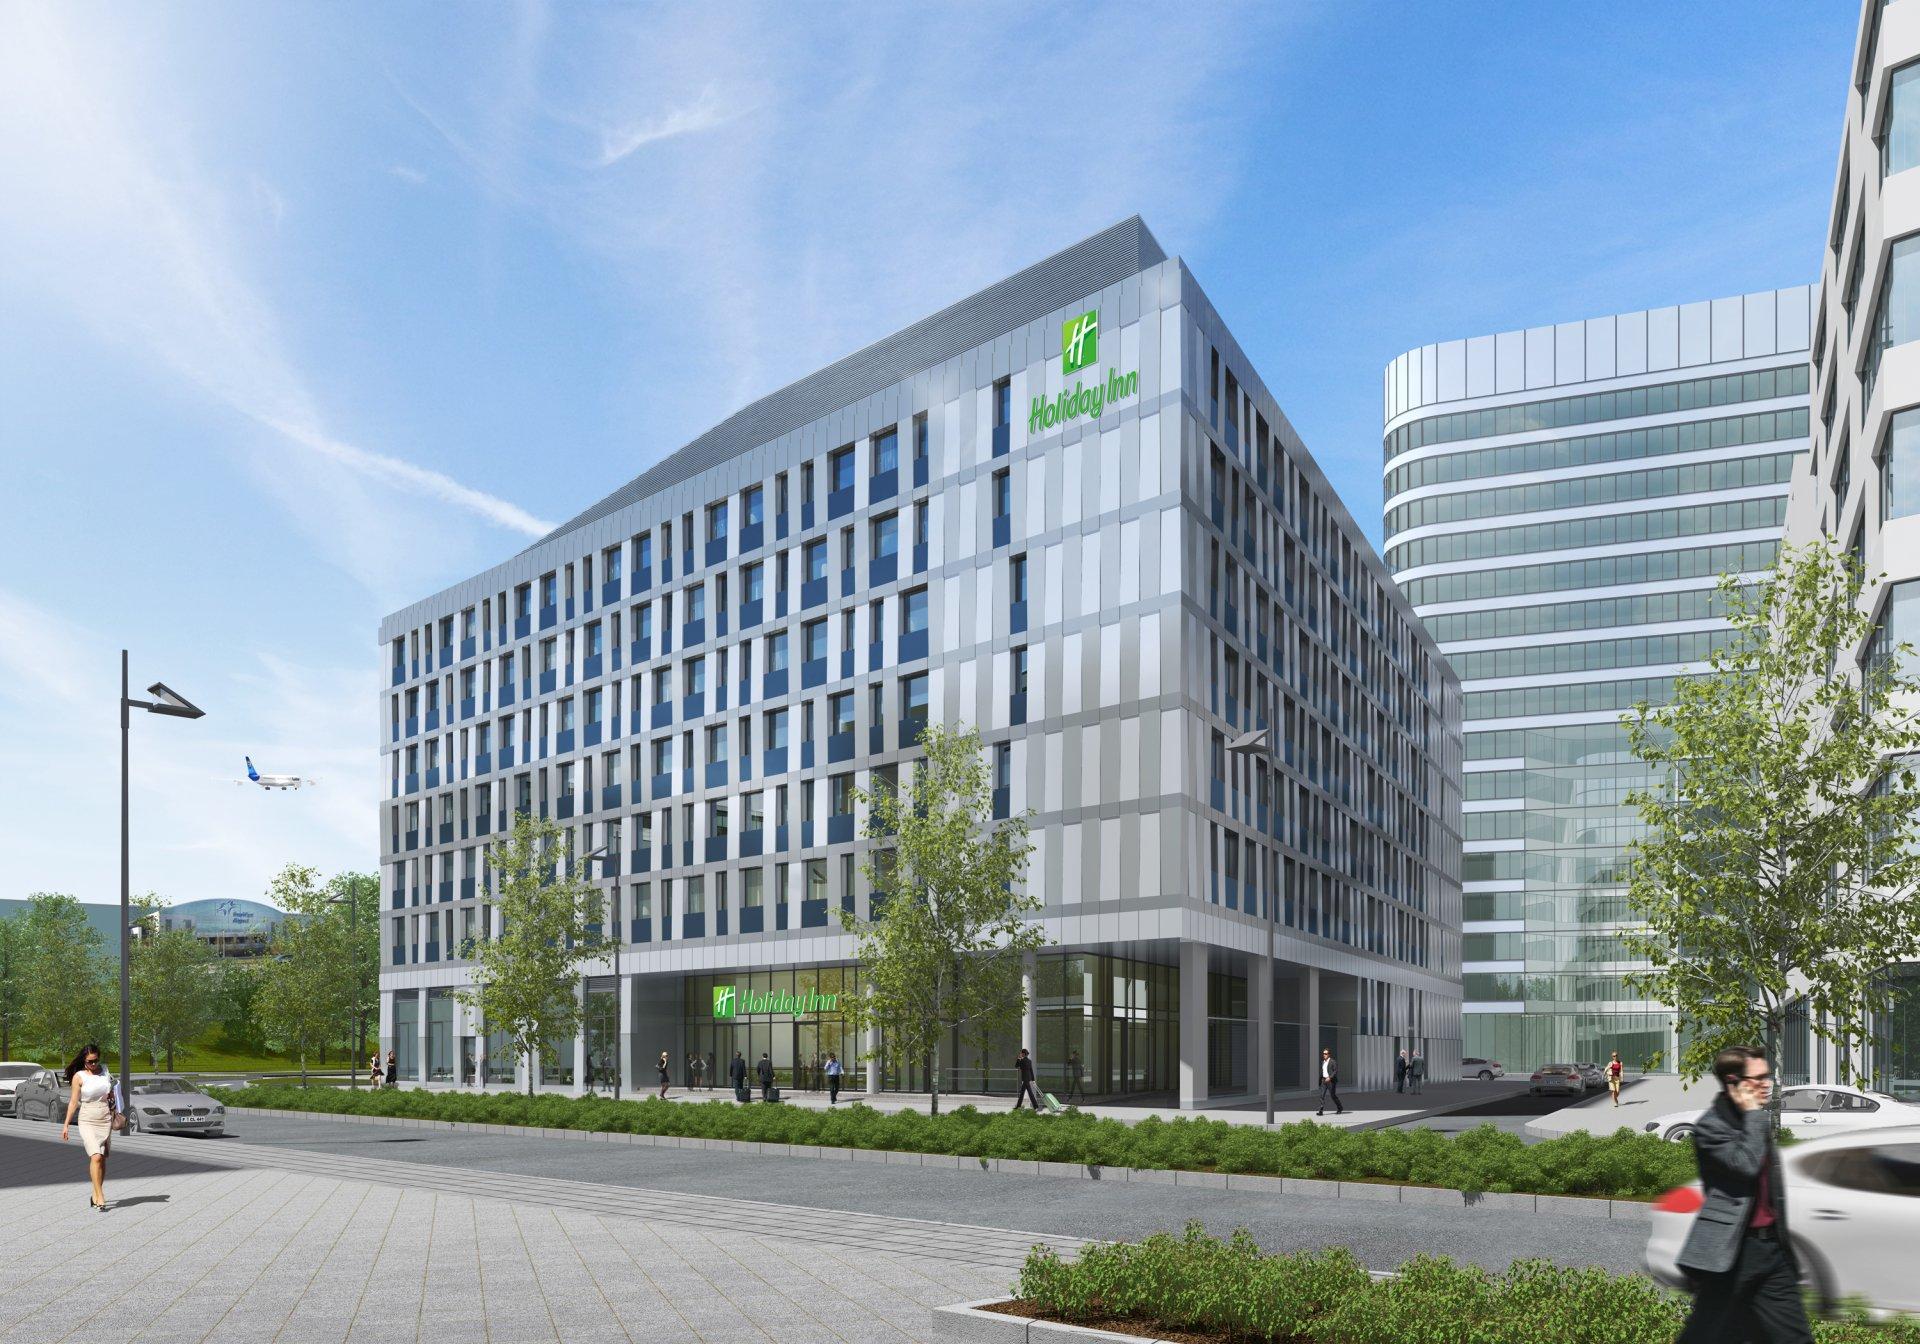 Holiday Inn in Frankfurt Gateway Garden